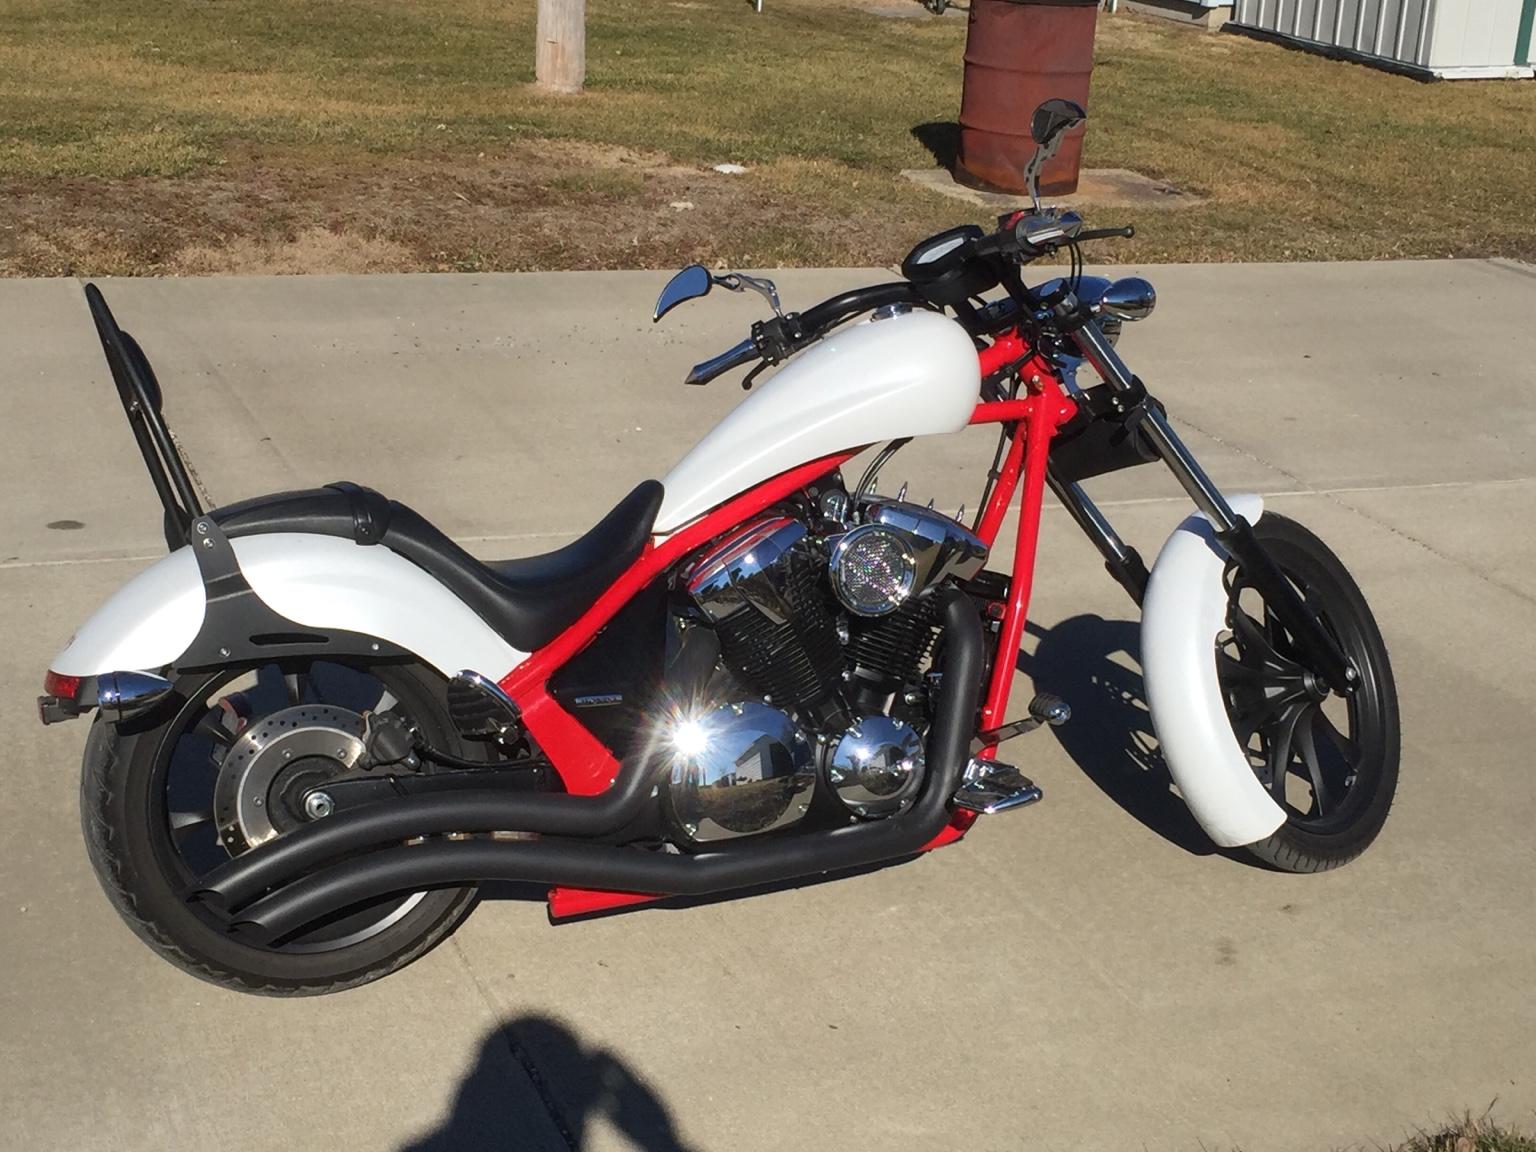 Let's show off our white Fury's - Honda Fury Forums: Honda Chopper Forum